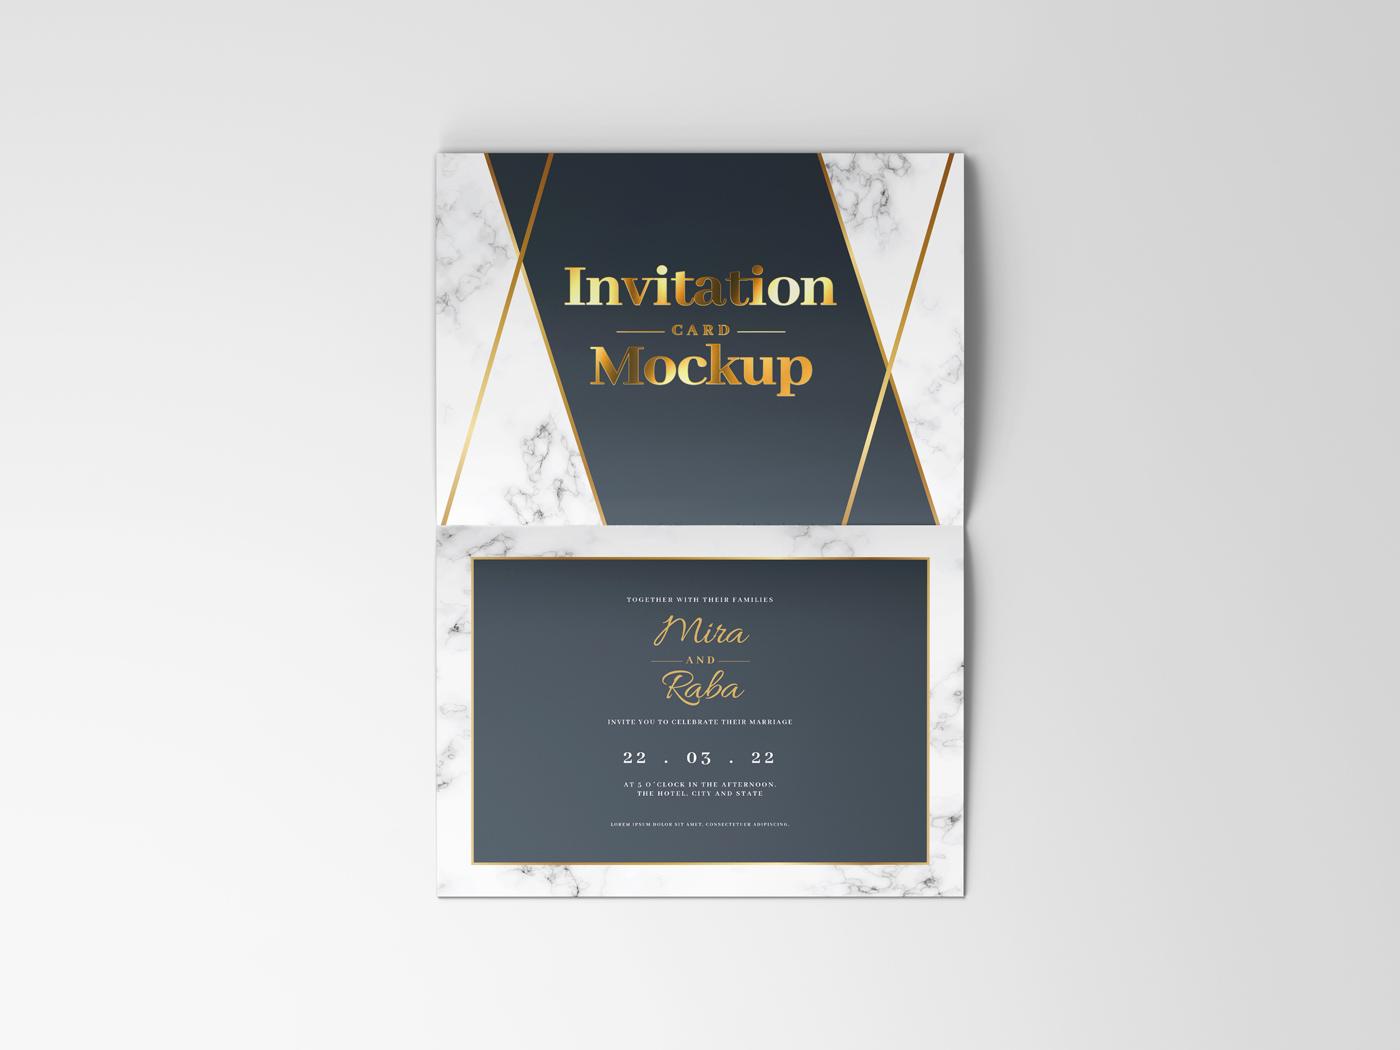 Invitation Card Mockups V1 example image 15